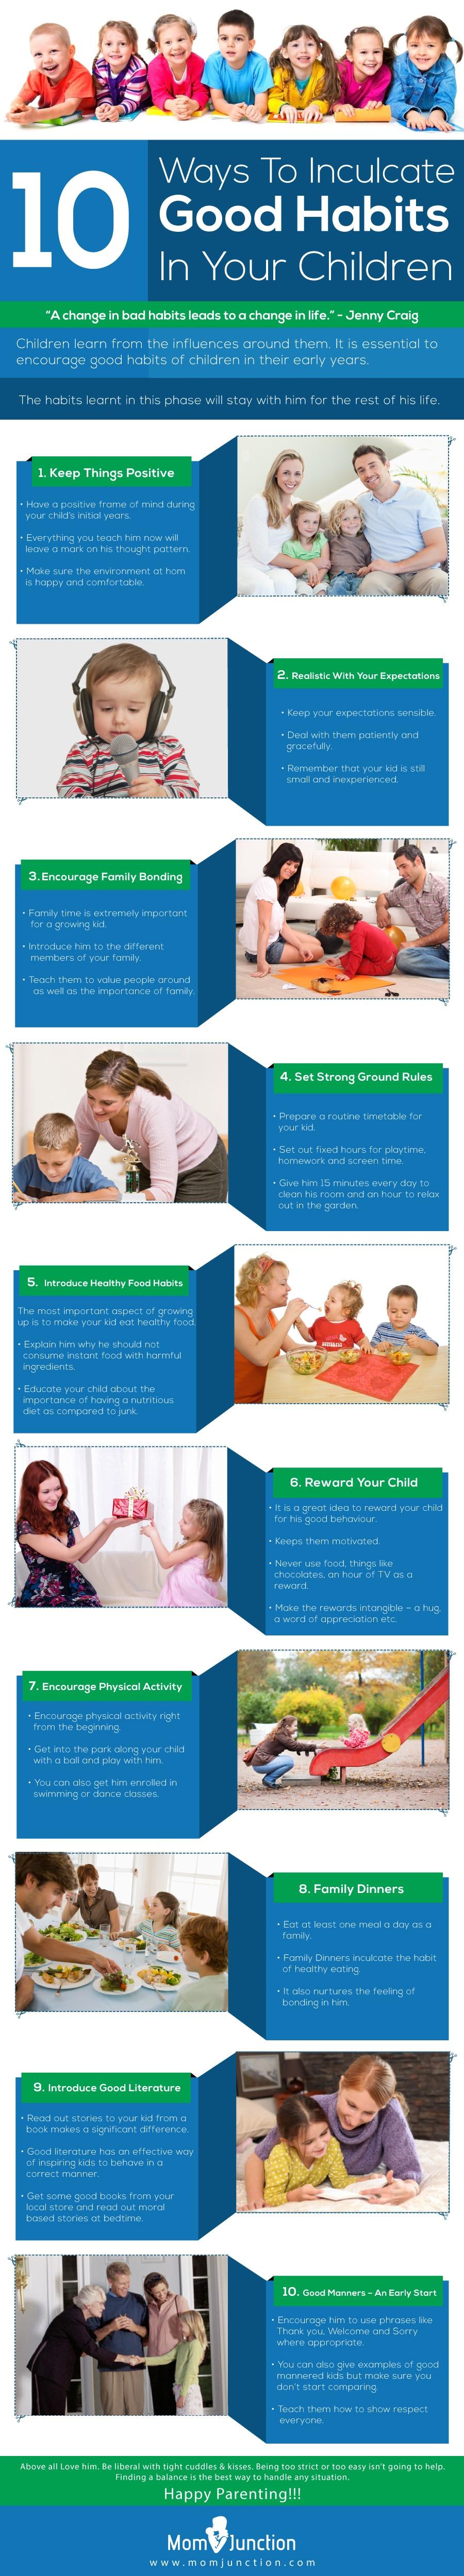 25 Ways To Inculcate Good Habits In Children